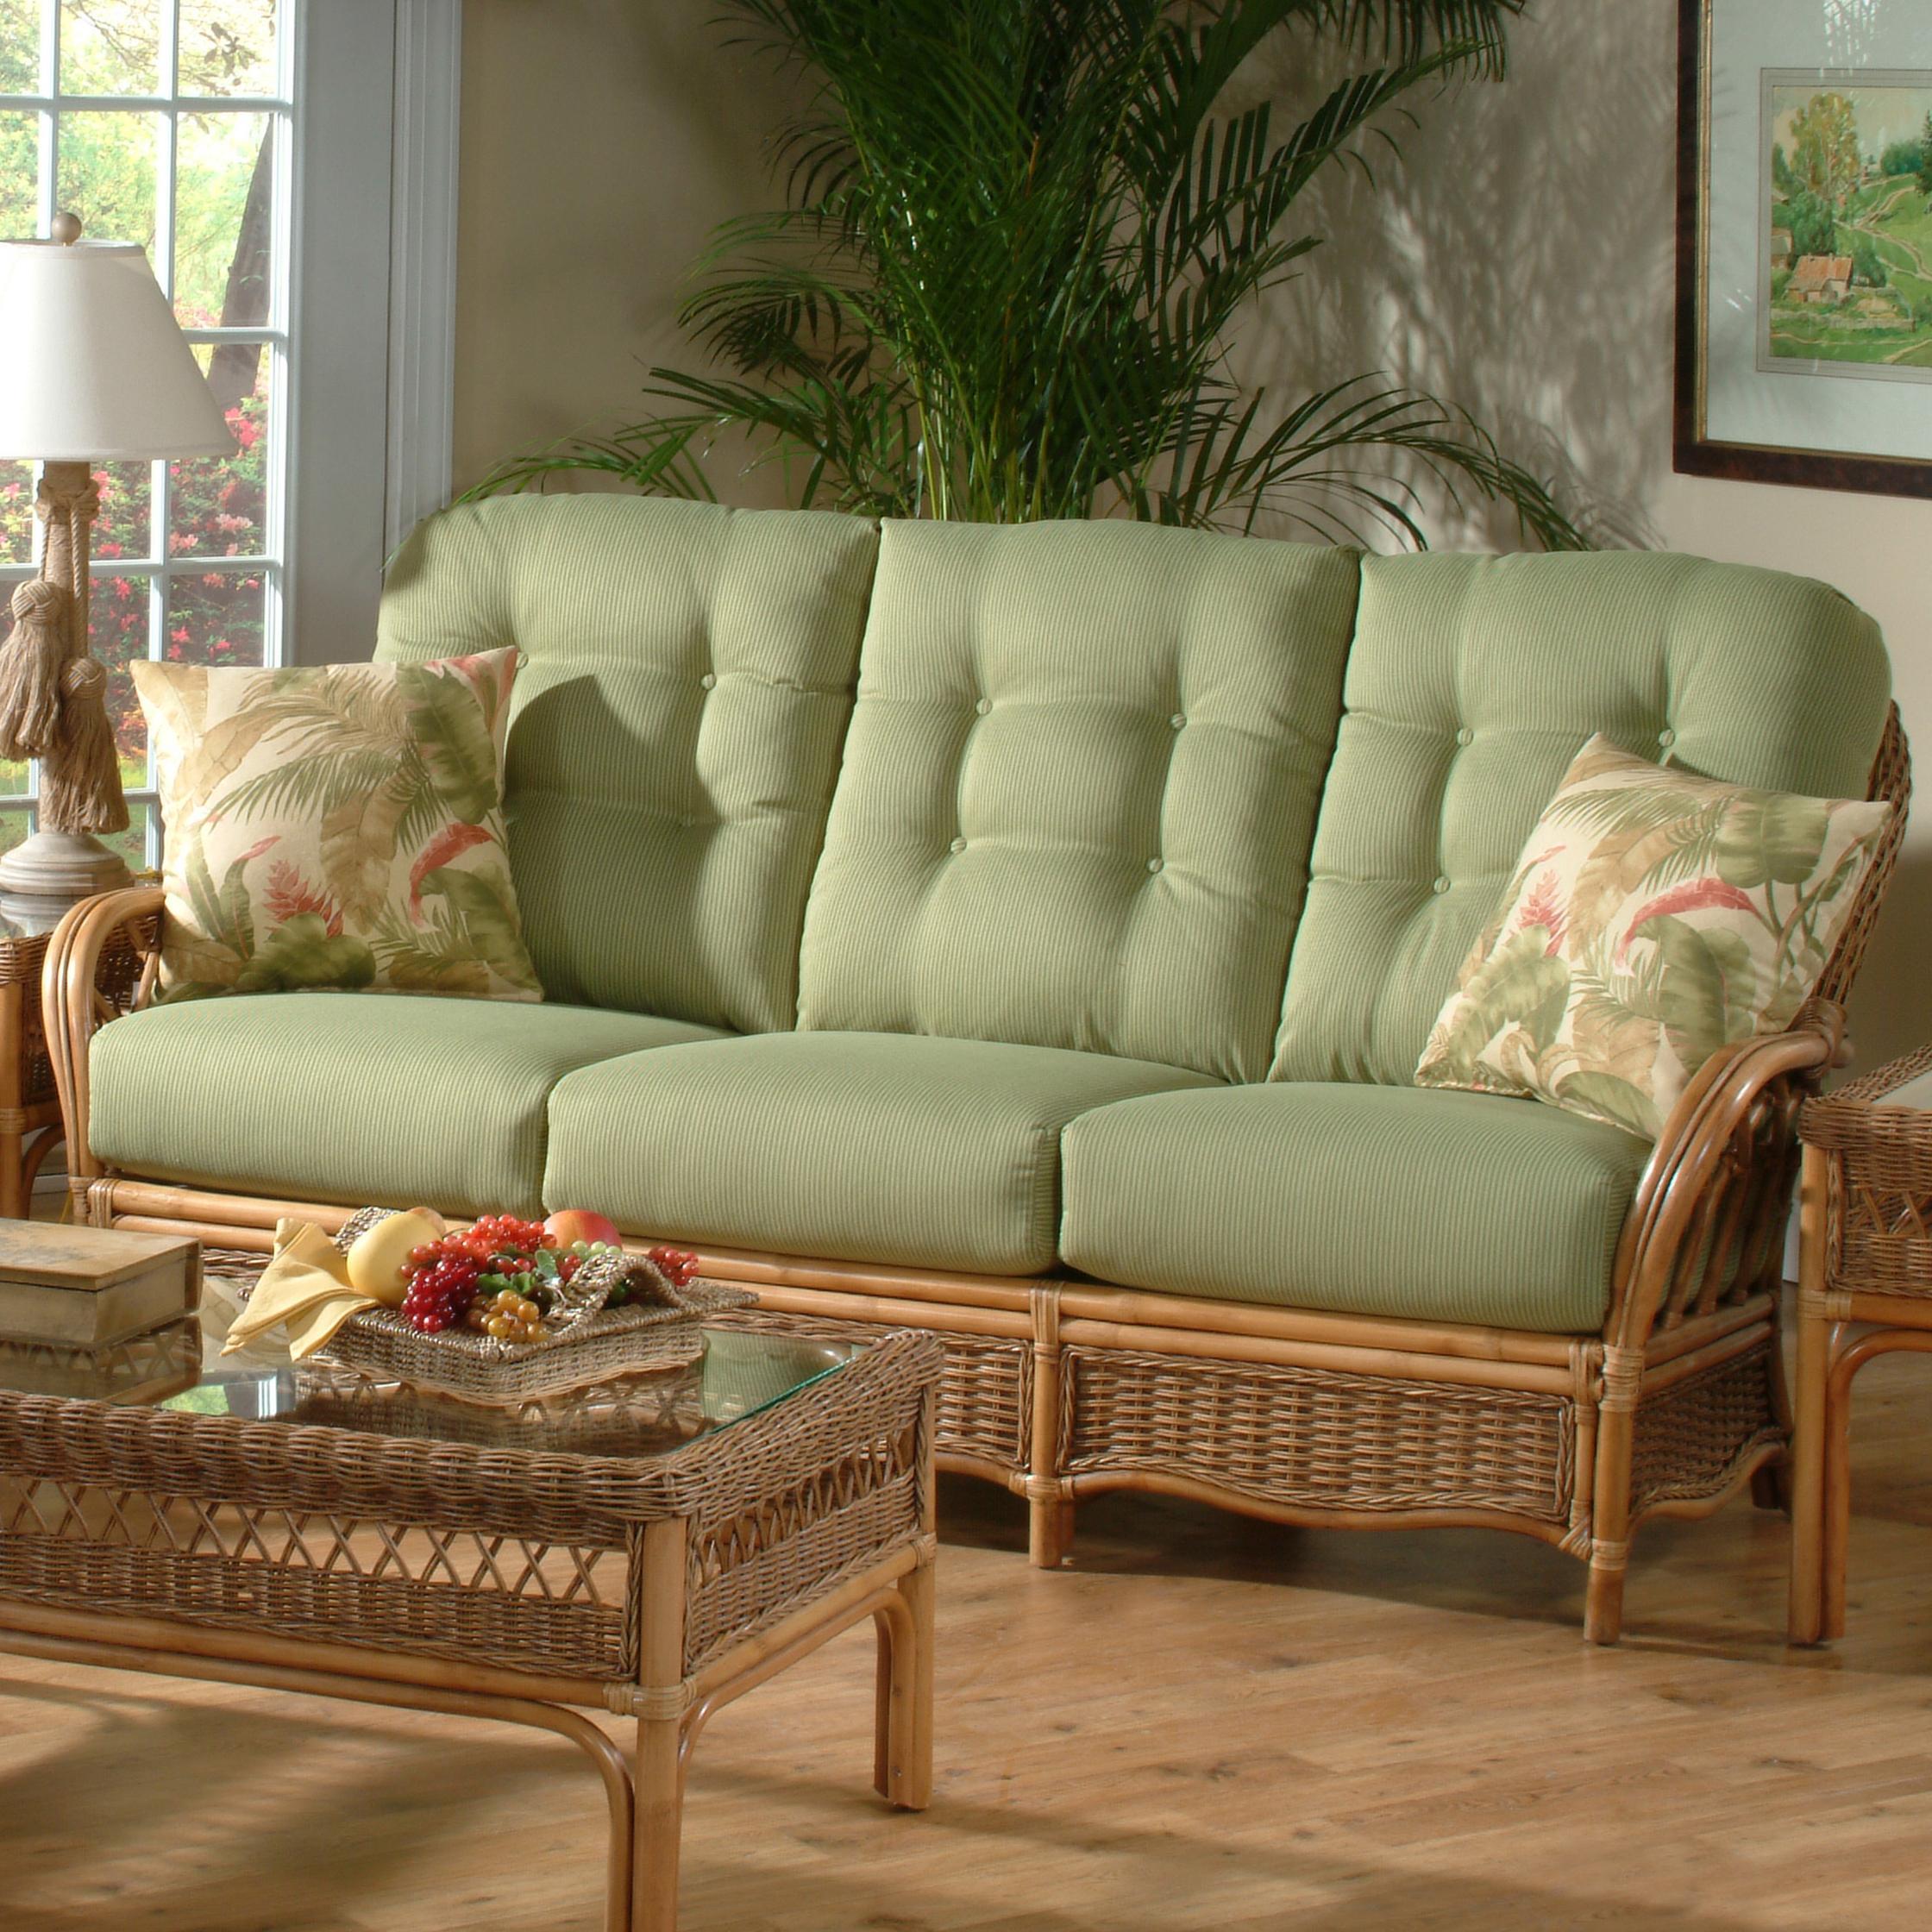 Braxton culler everglade tropical rattan sofa Braxton culler living room furniture